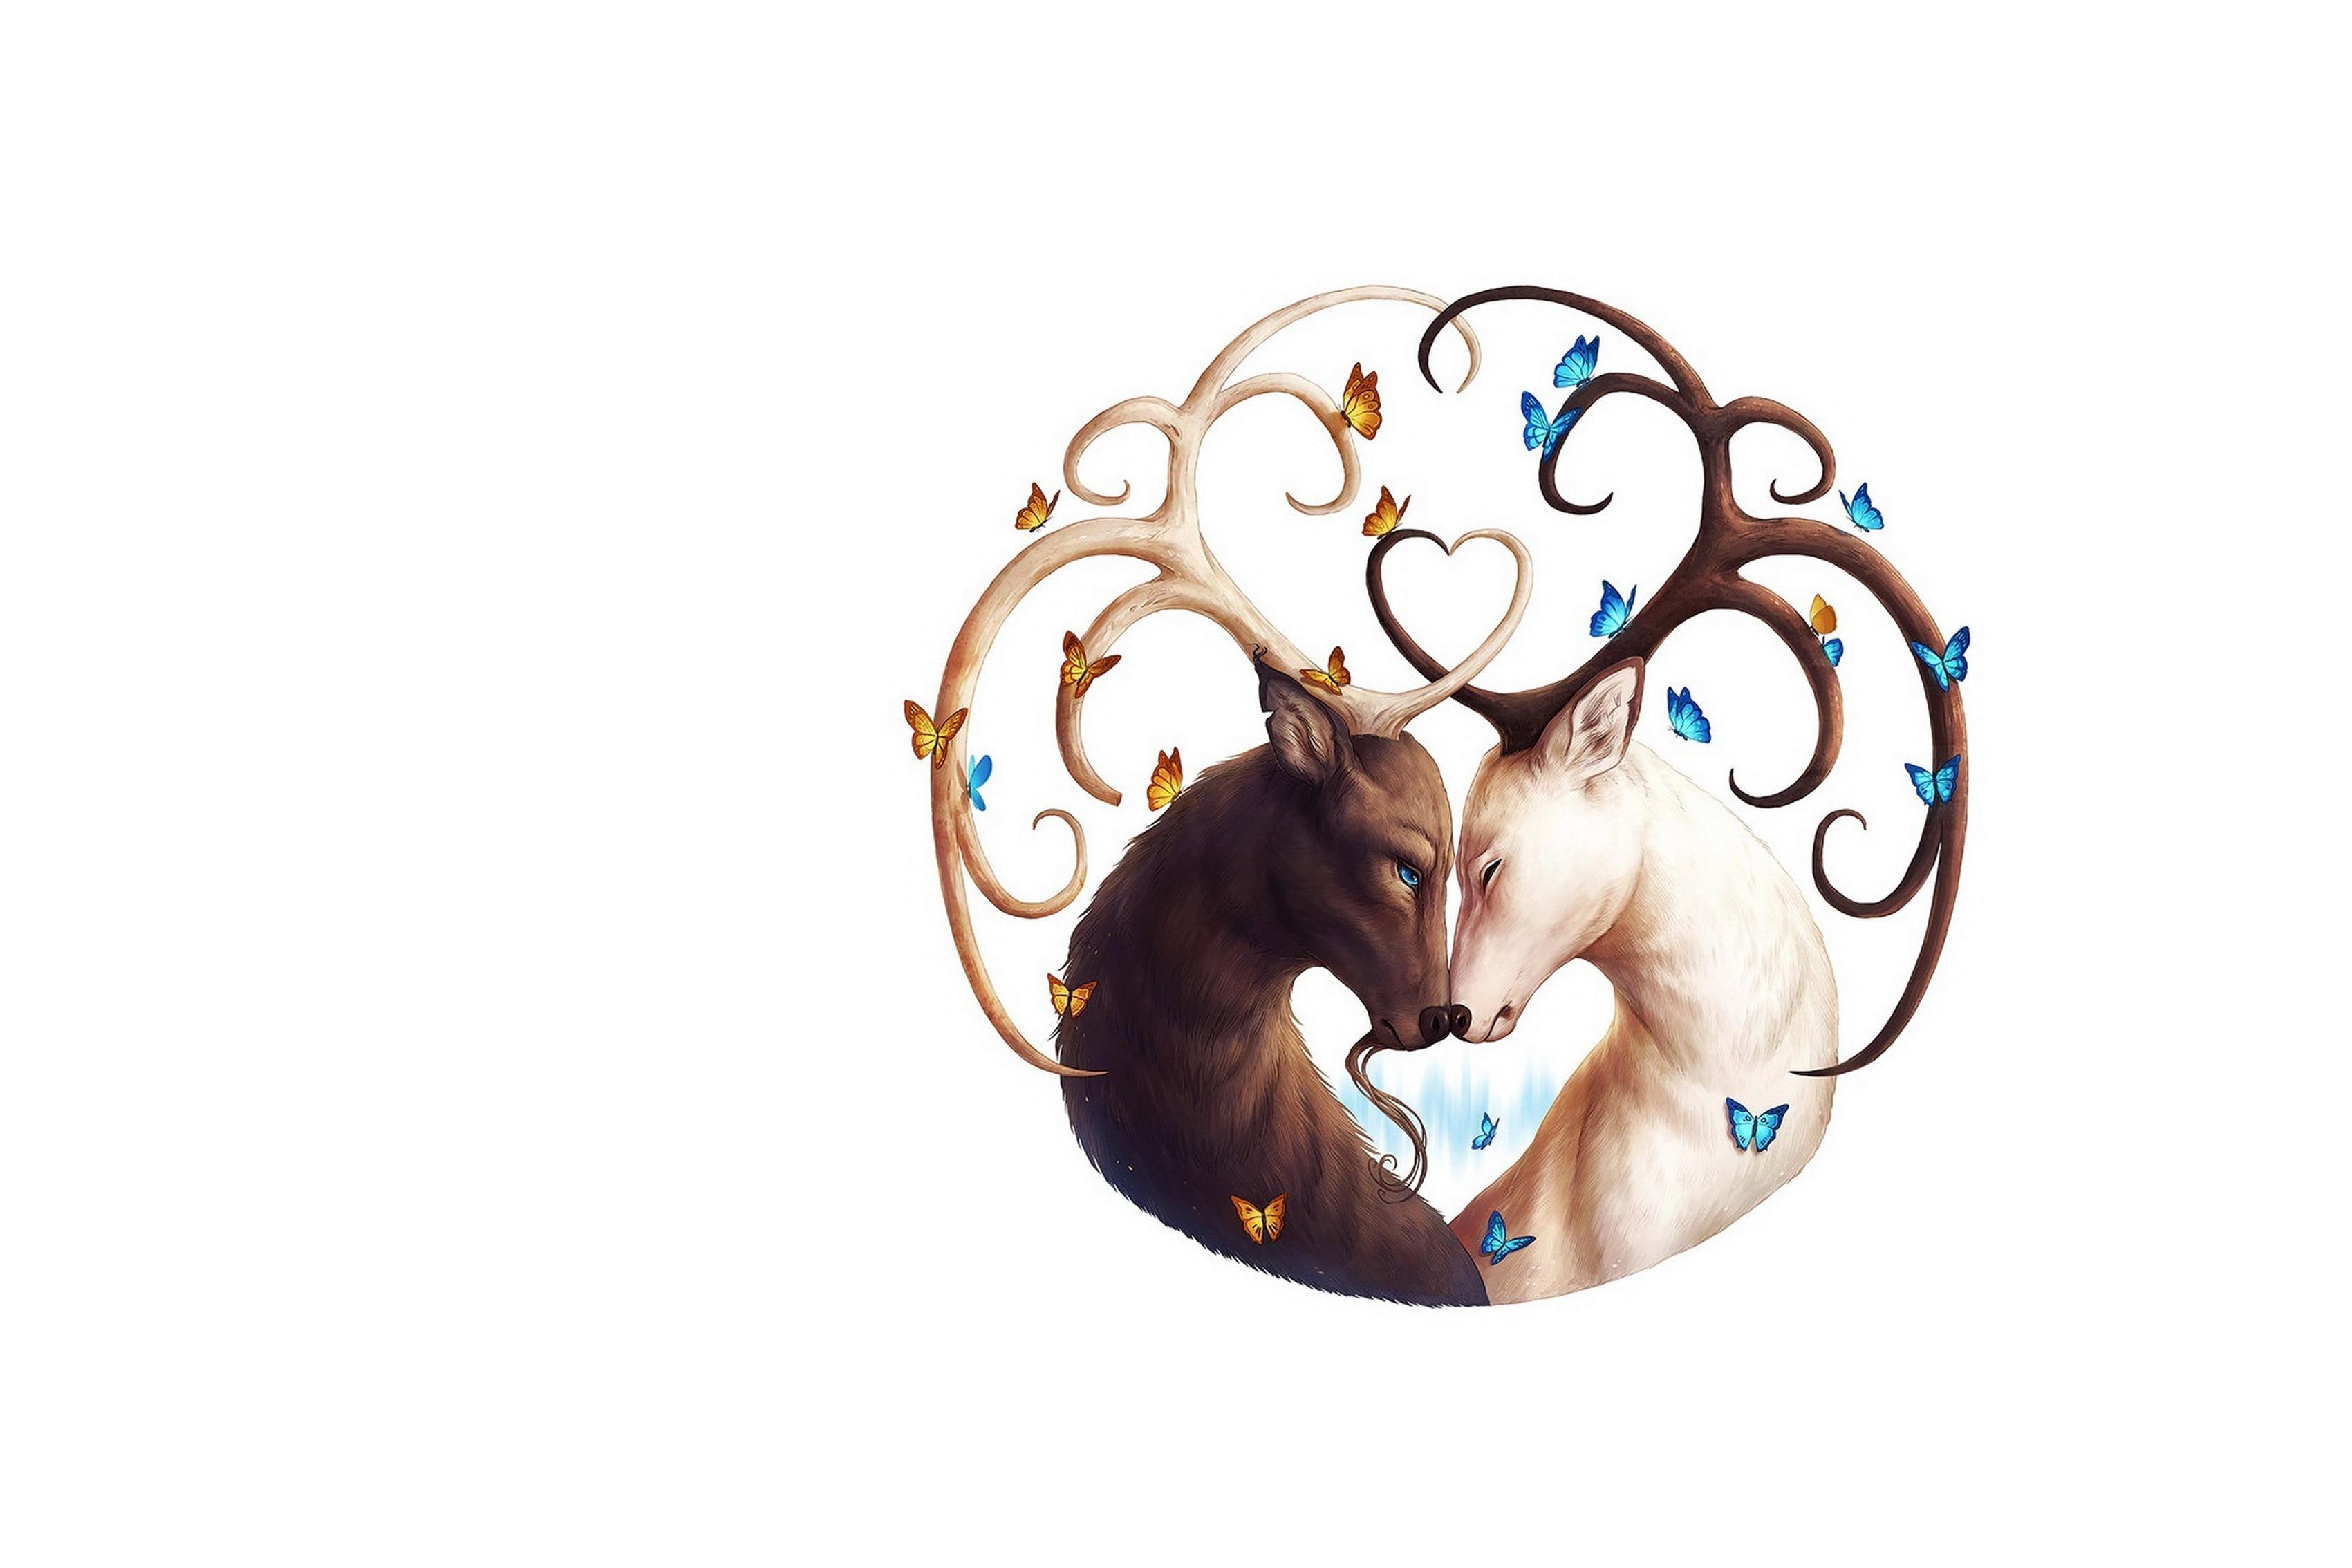 Simple Art Dessin Cerf Animal Couple Noir Blanc Salon